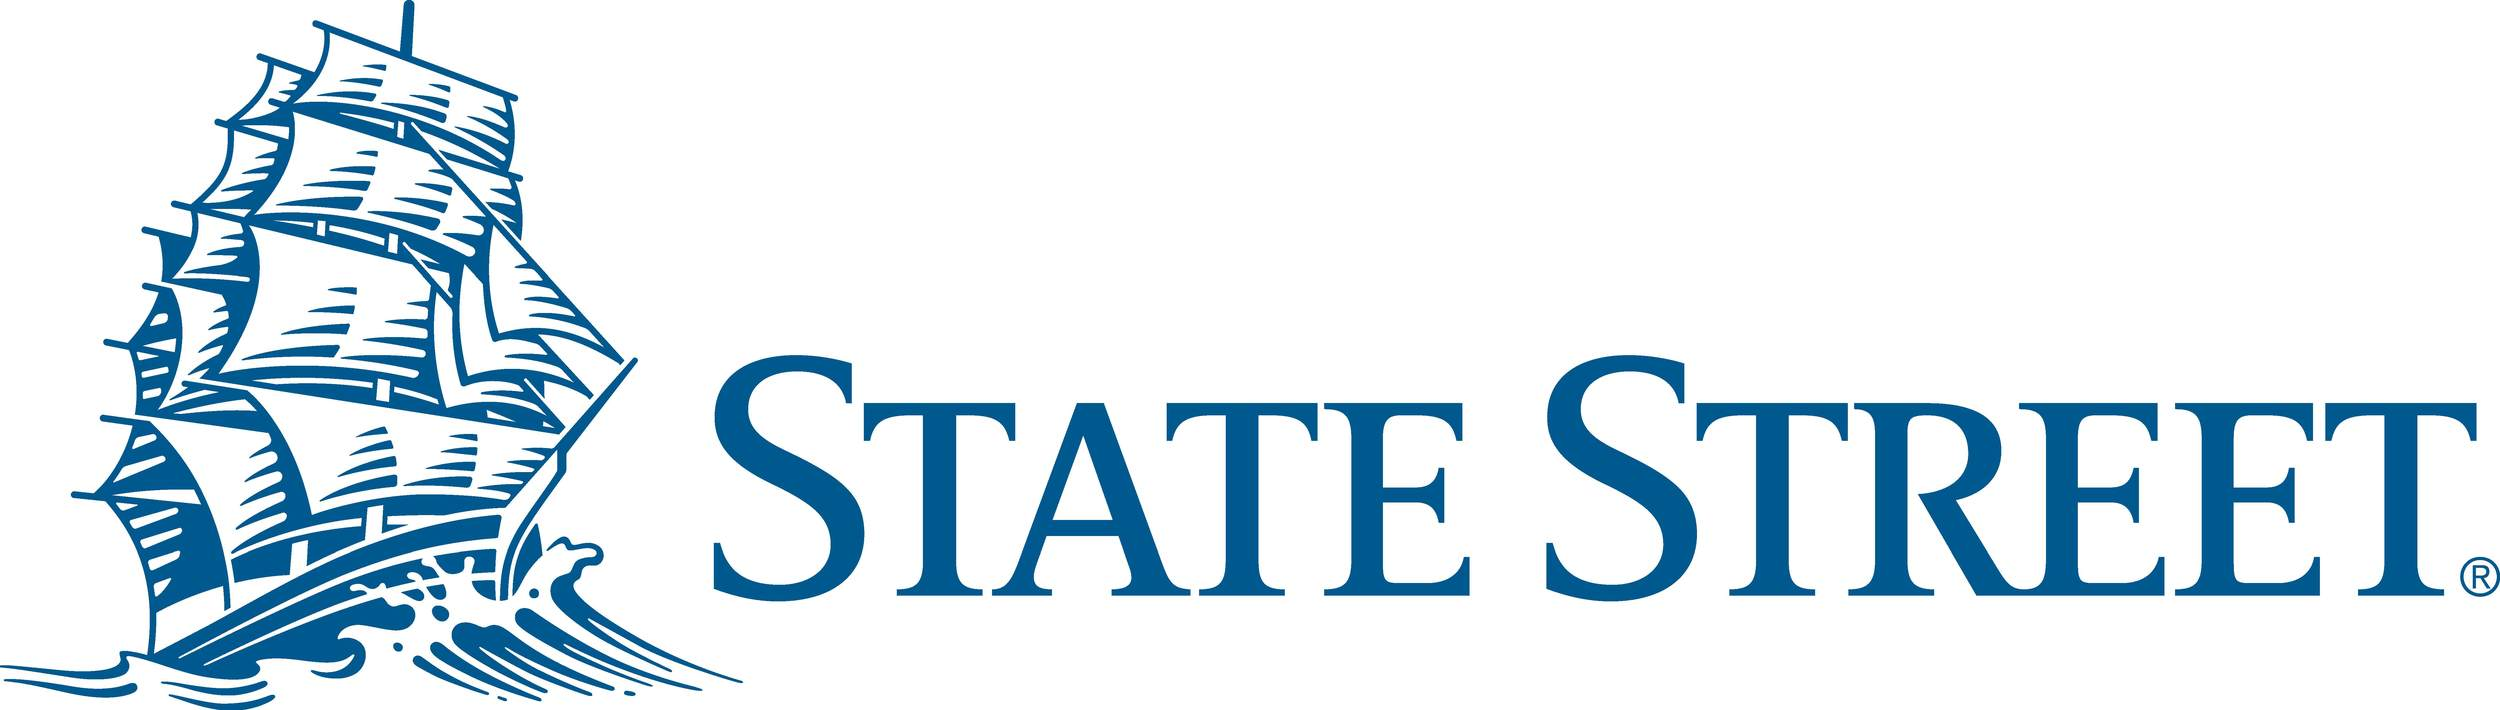 state street logo.jpg